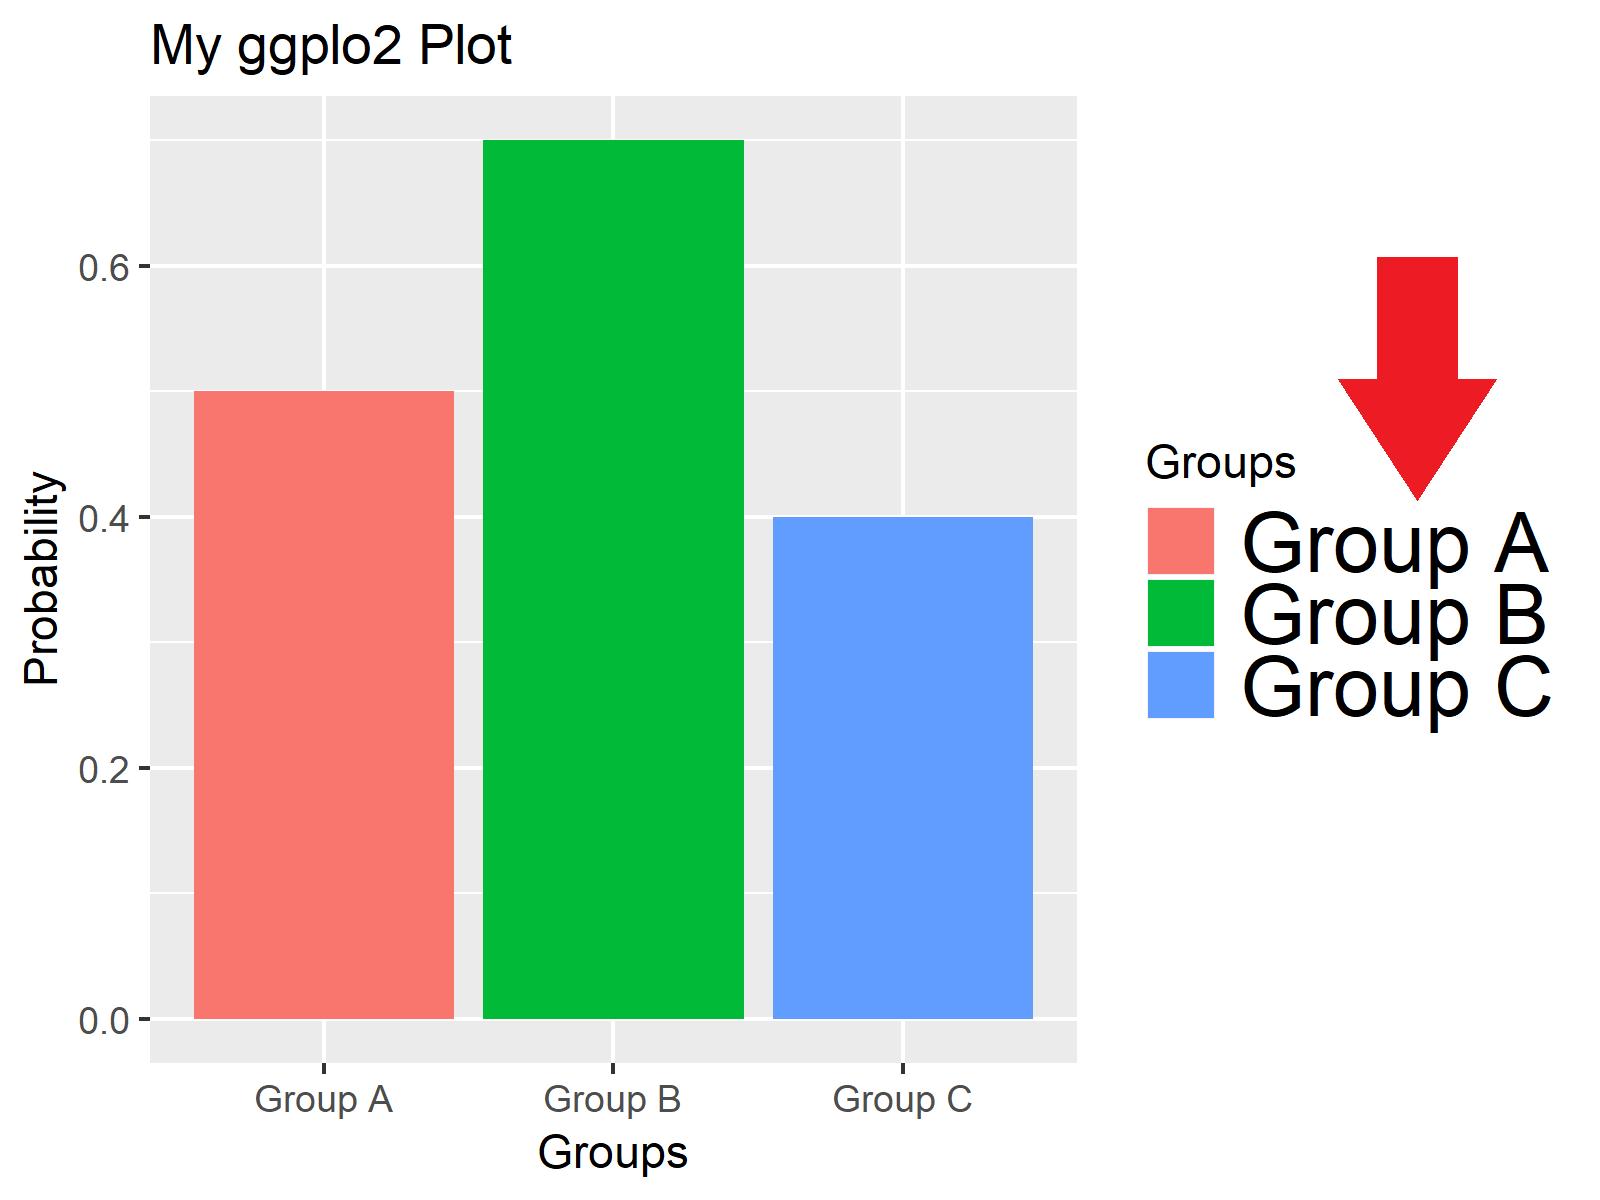 r ggplot2 plot font size of legend text